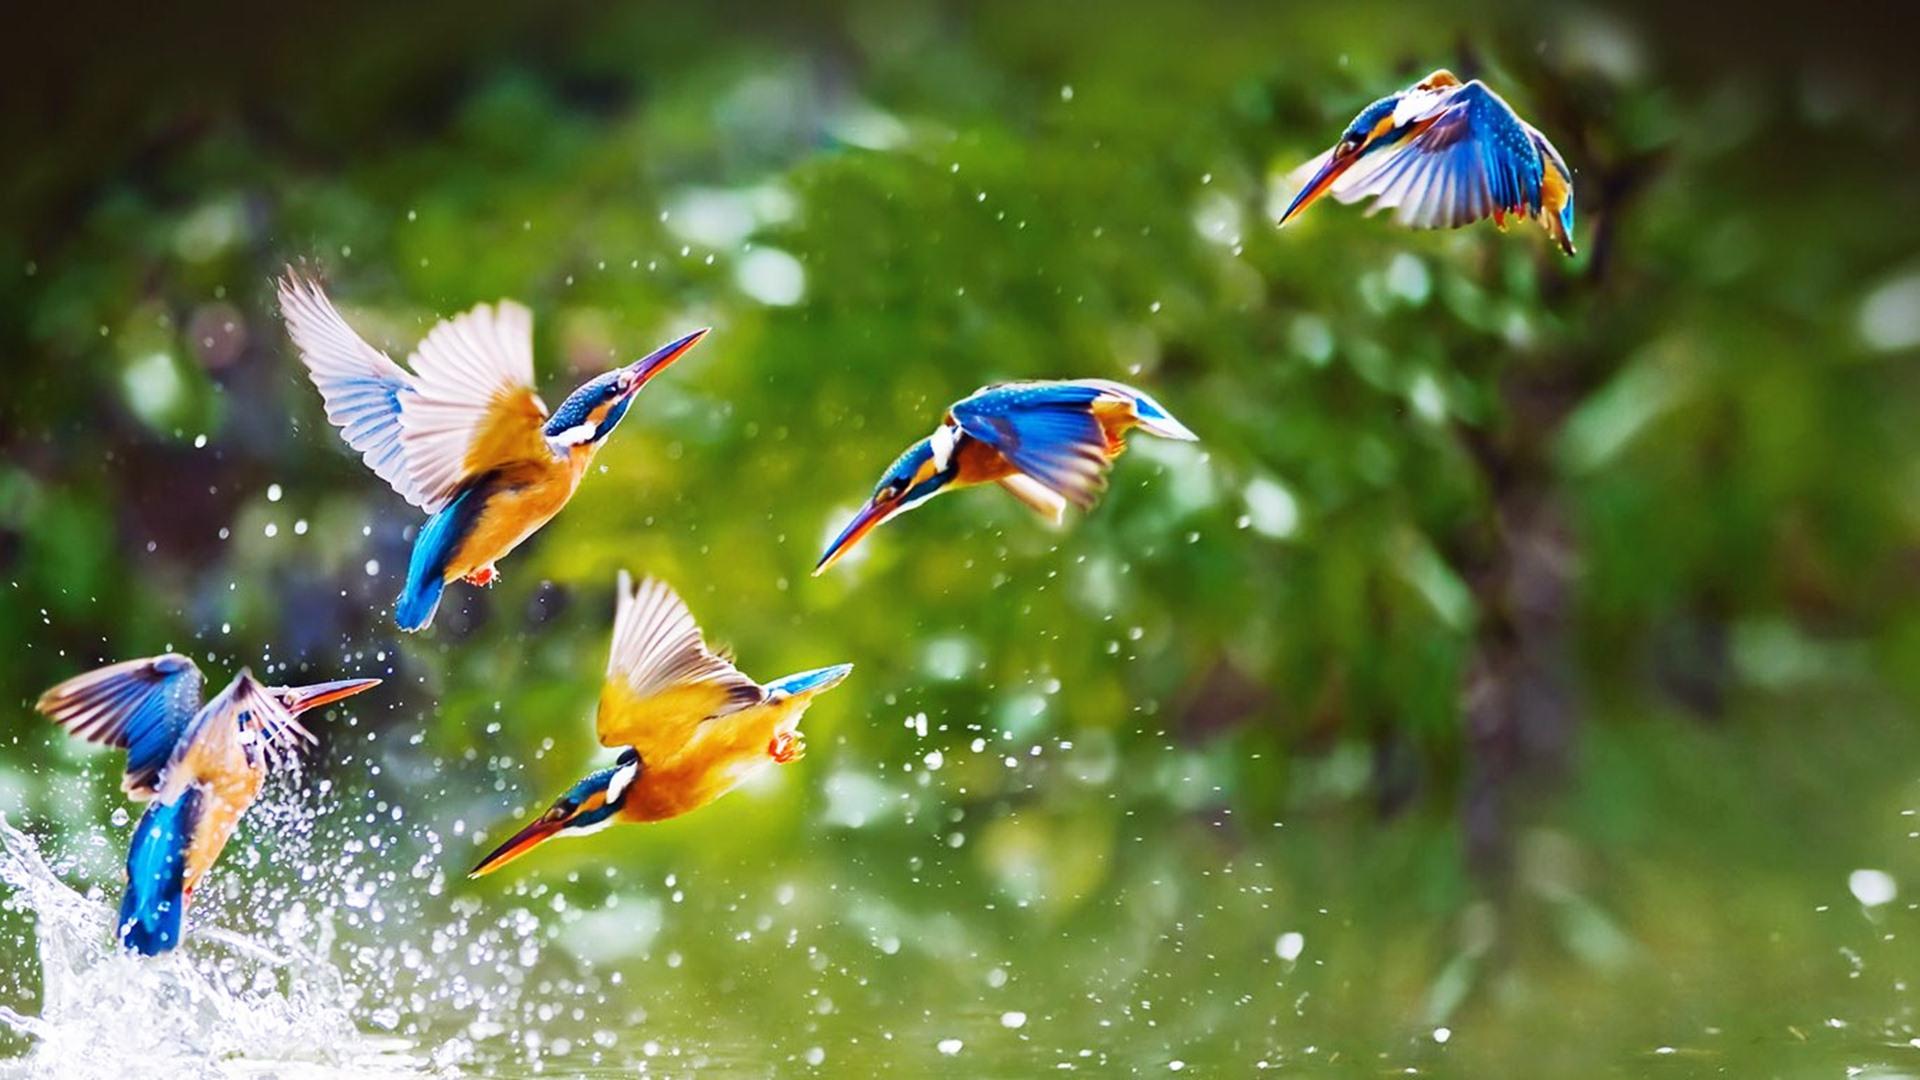 Hd wallpaper eagle - Birds Flying Wallpaper Wallpapersafari